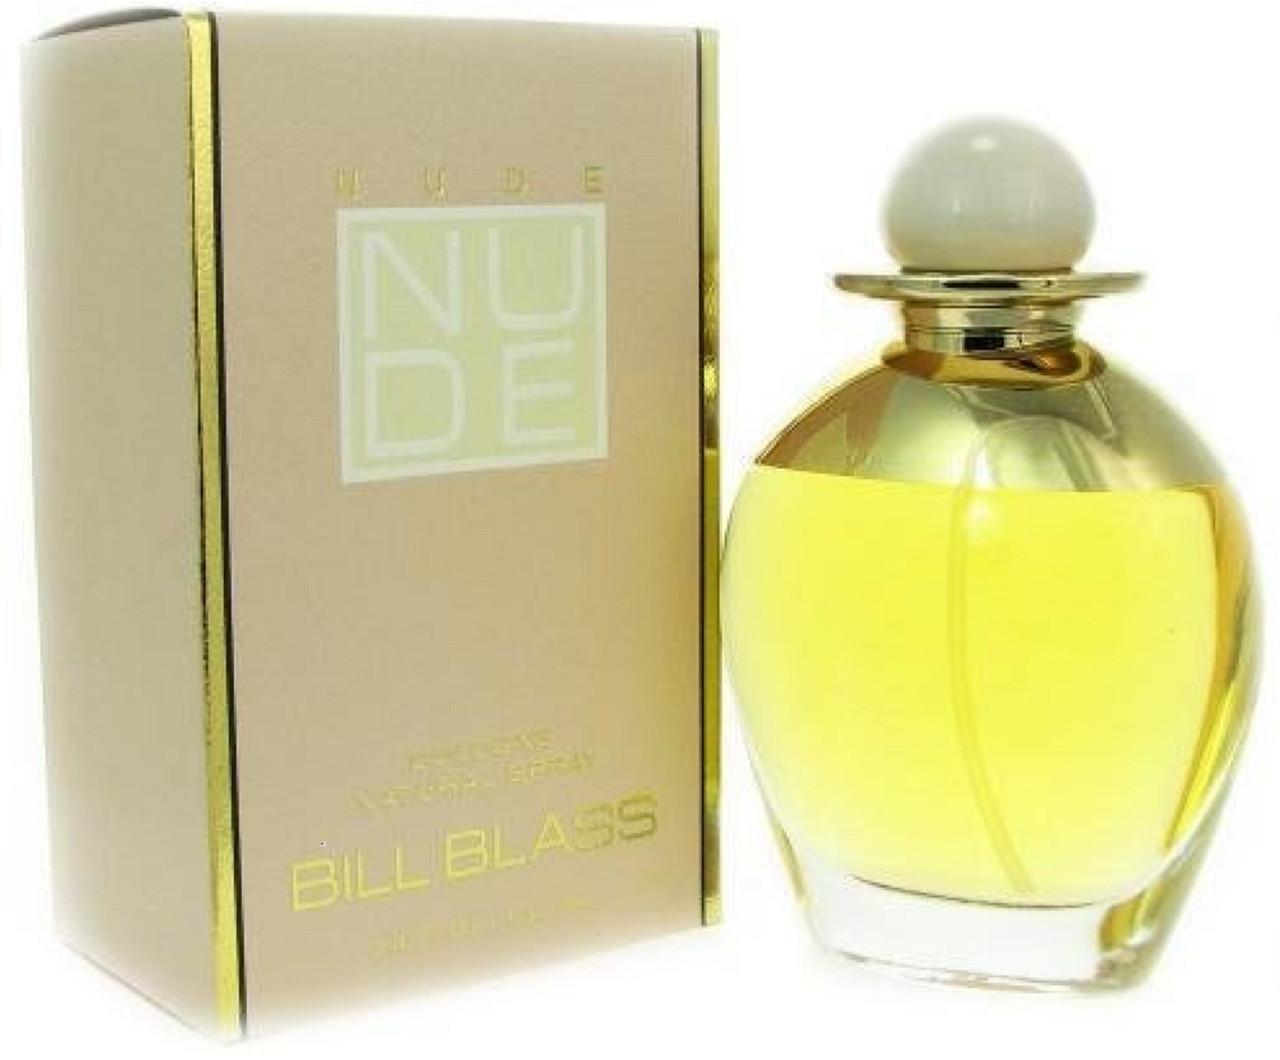 Bill Blass Women's Nude Cologne 3.4 oz